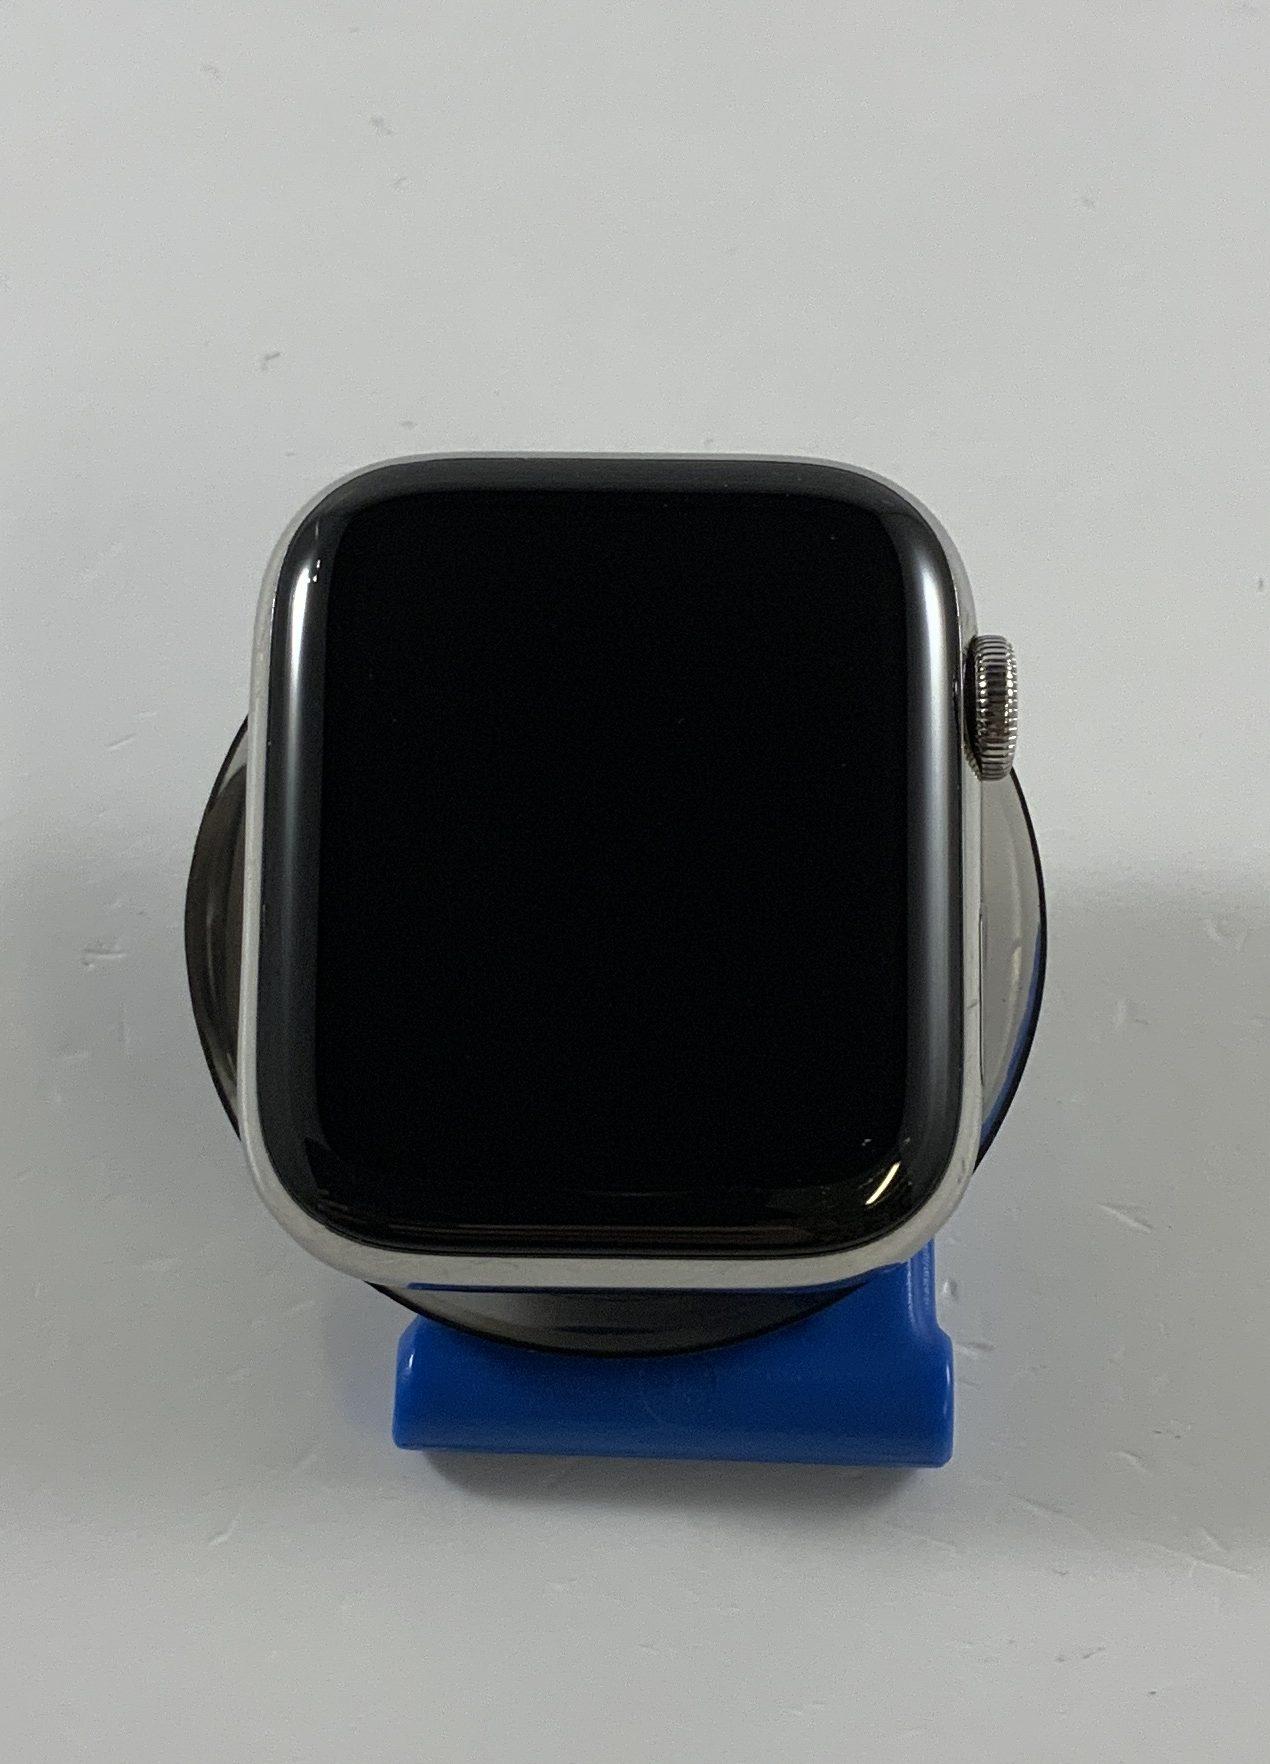 Watch Series 5 Steel Cellular (44mm), Silver, imagen 1